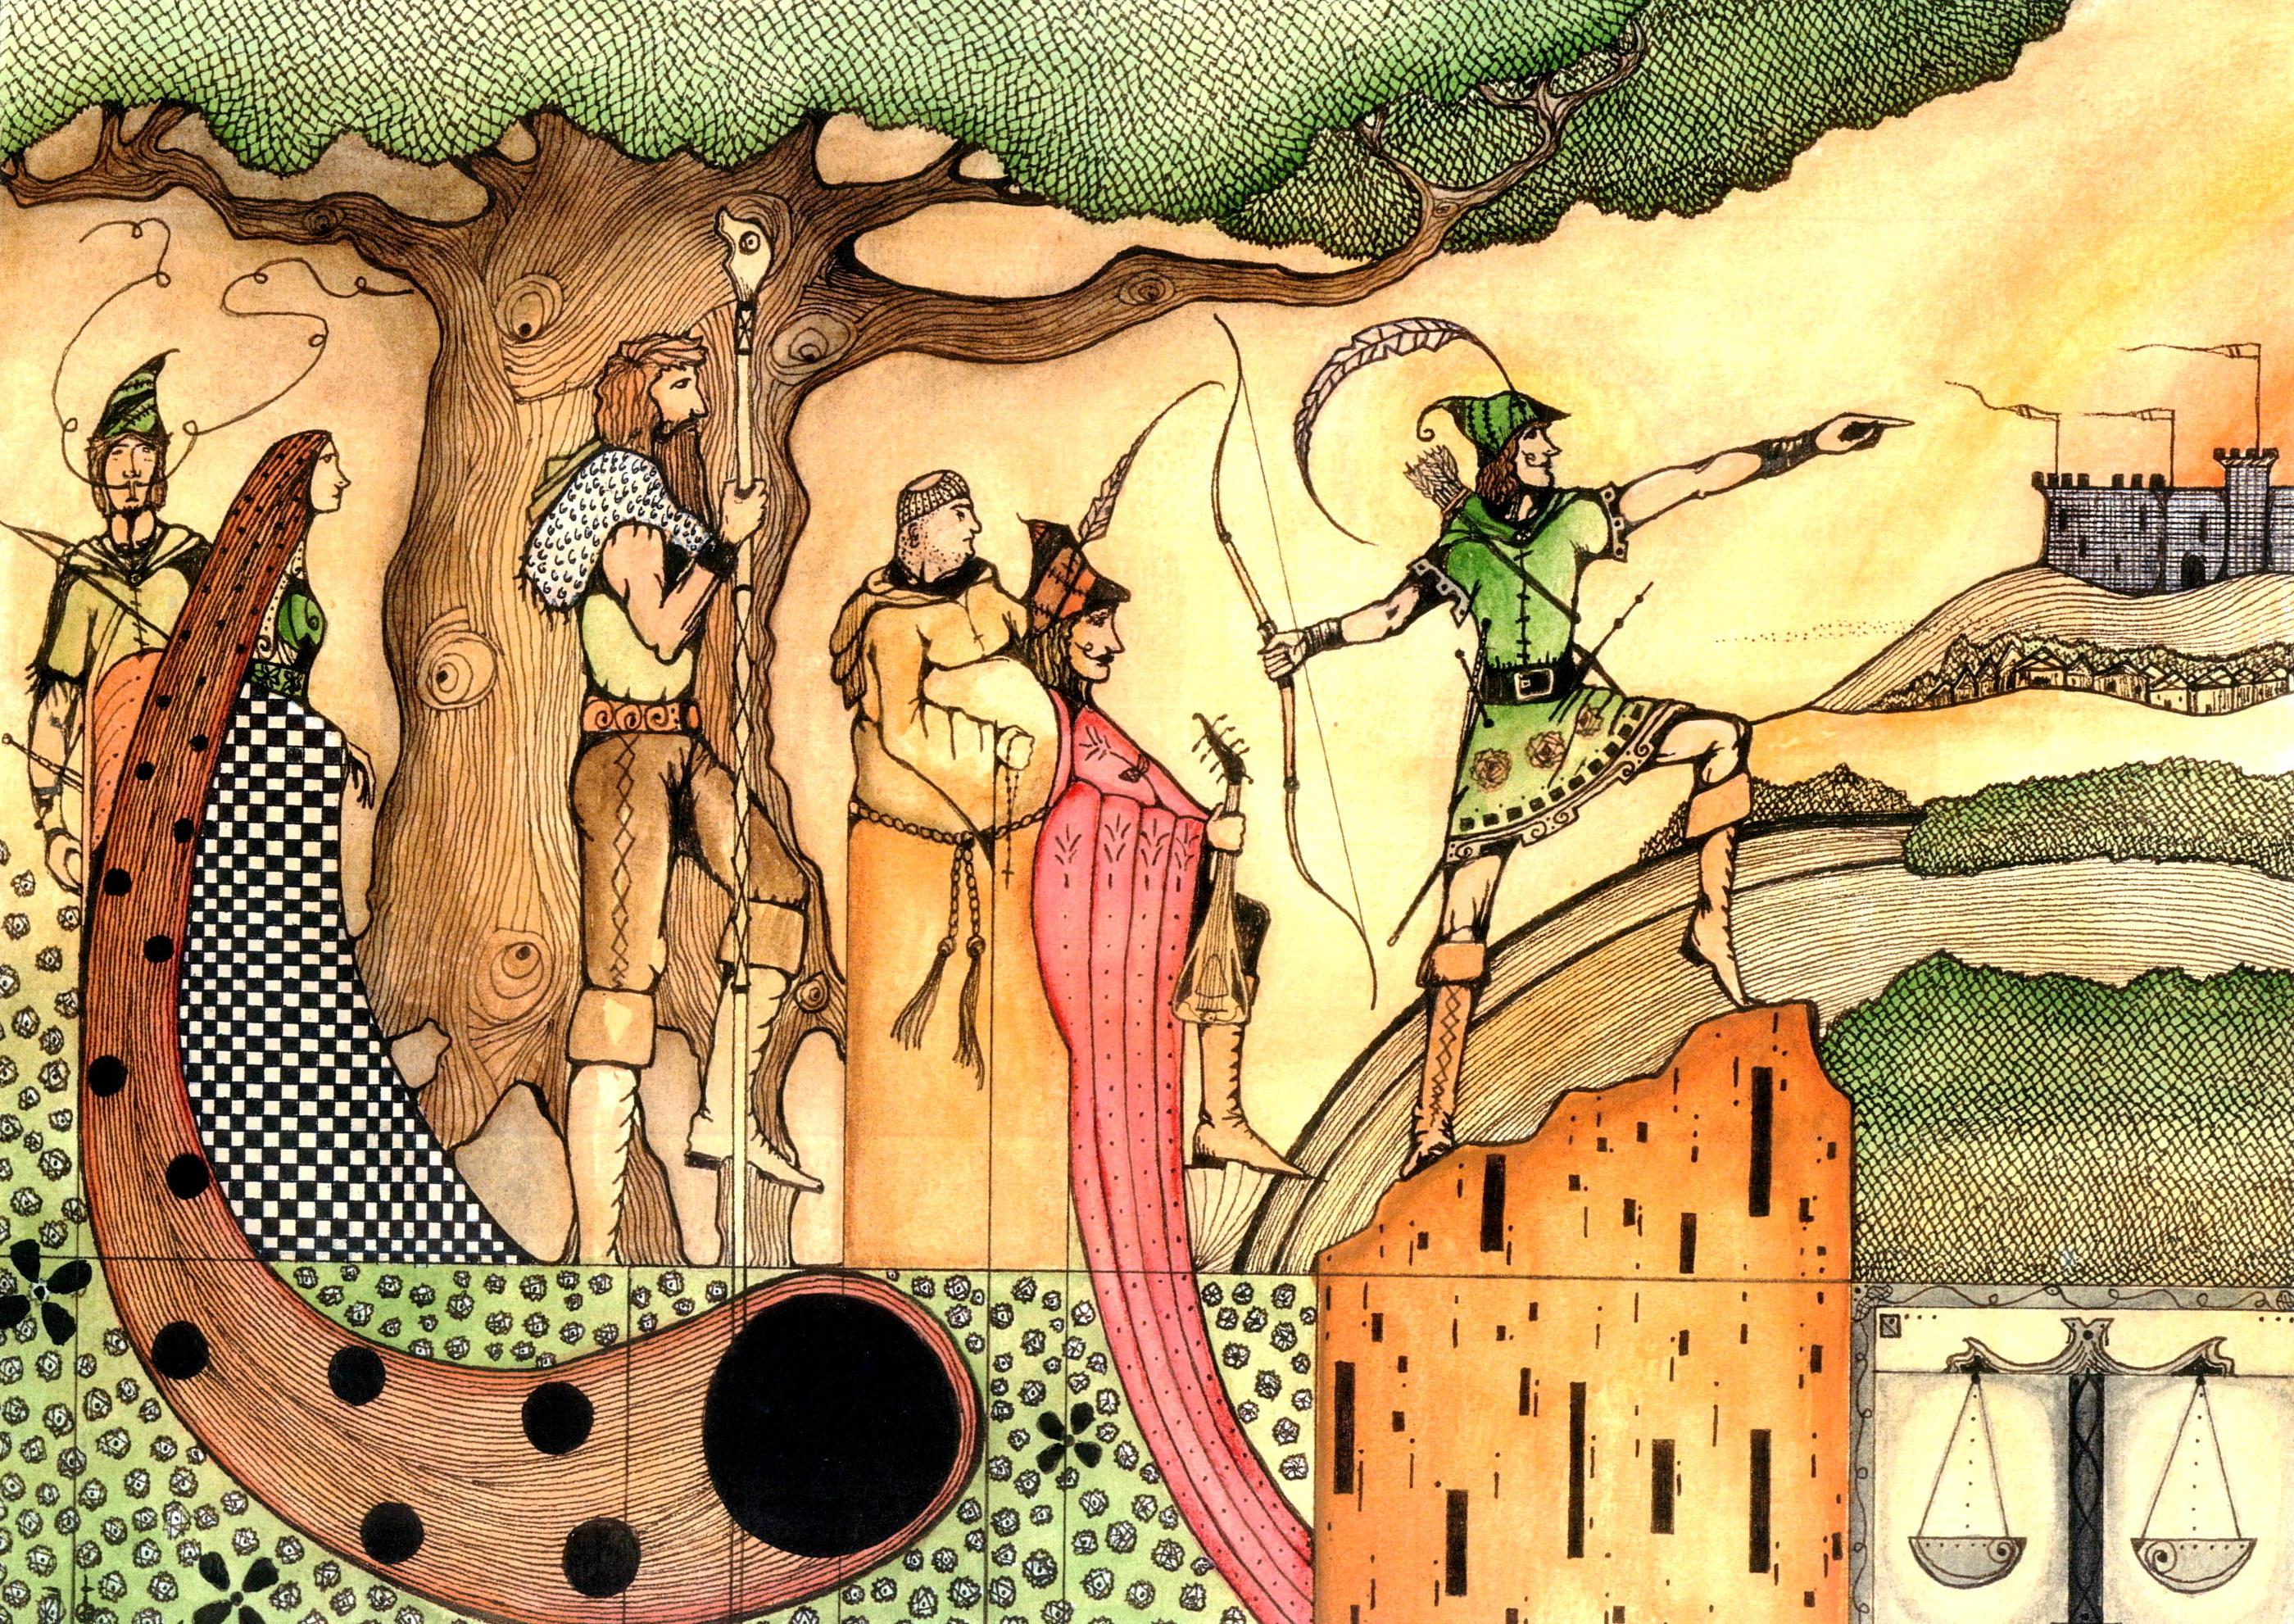 Robin Hood by Artofwarble